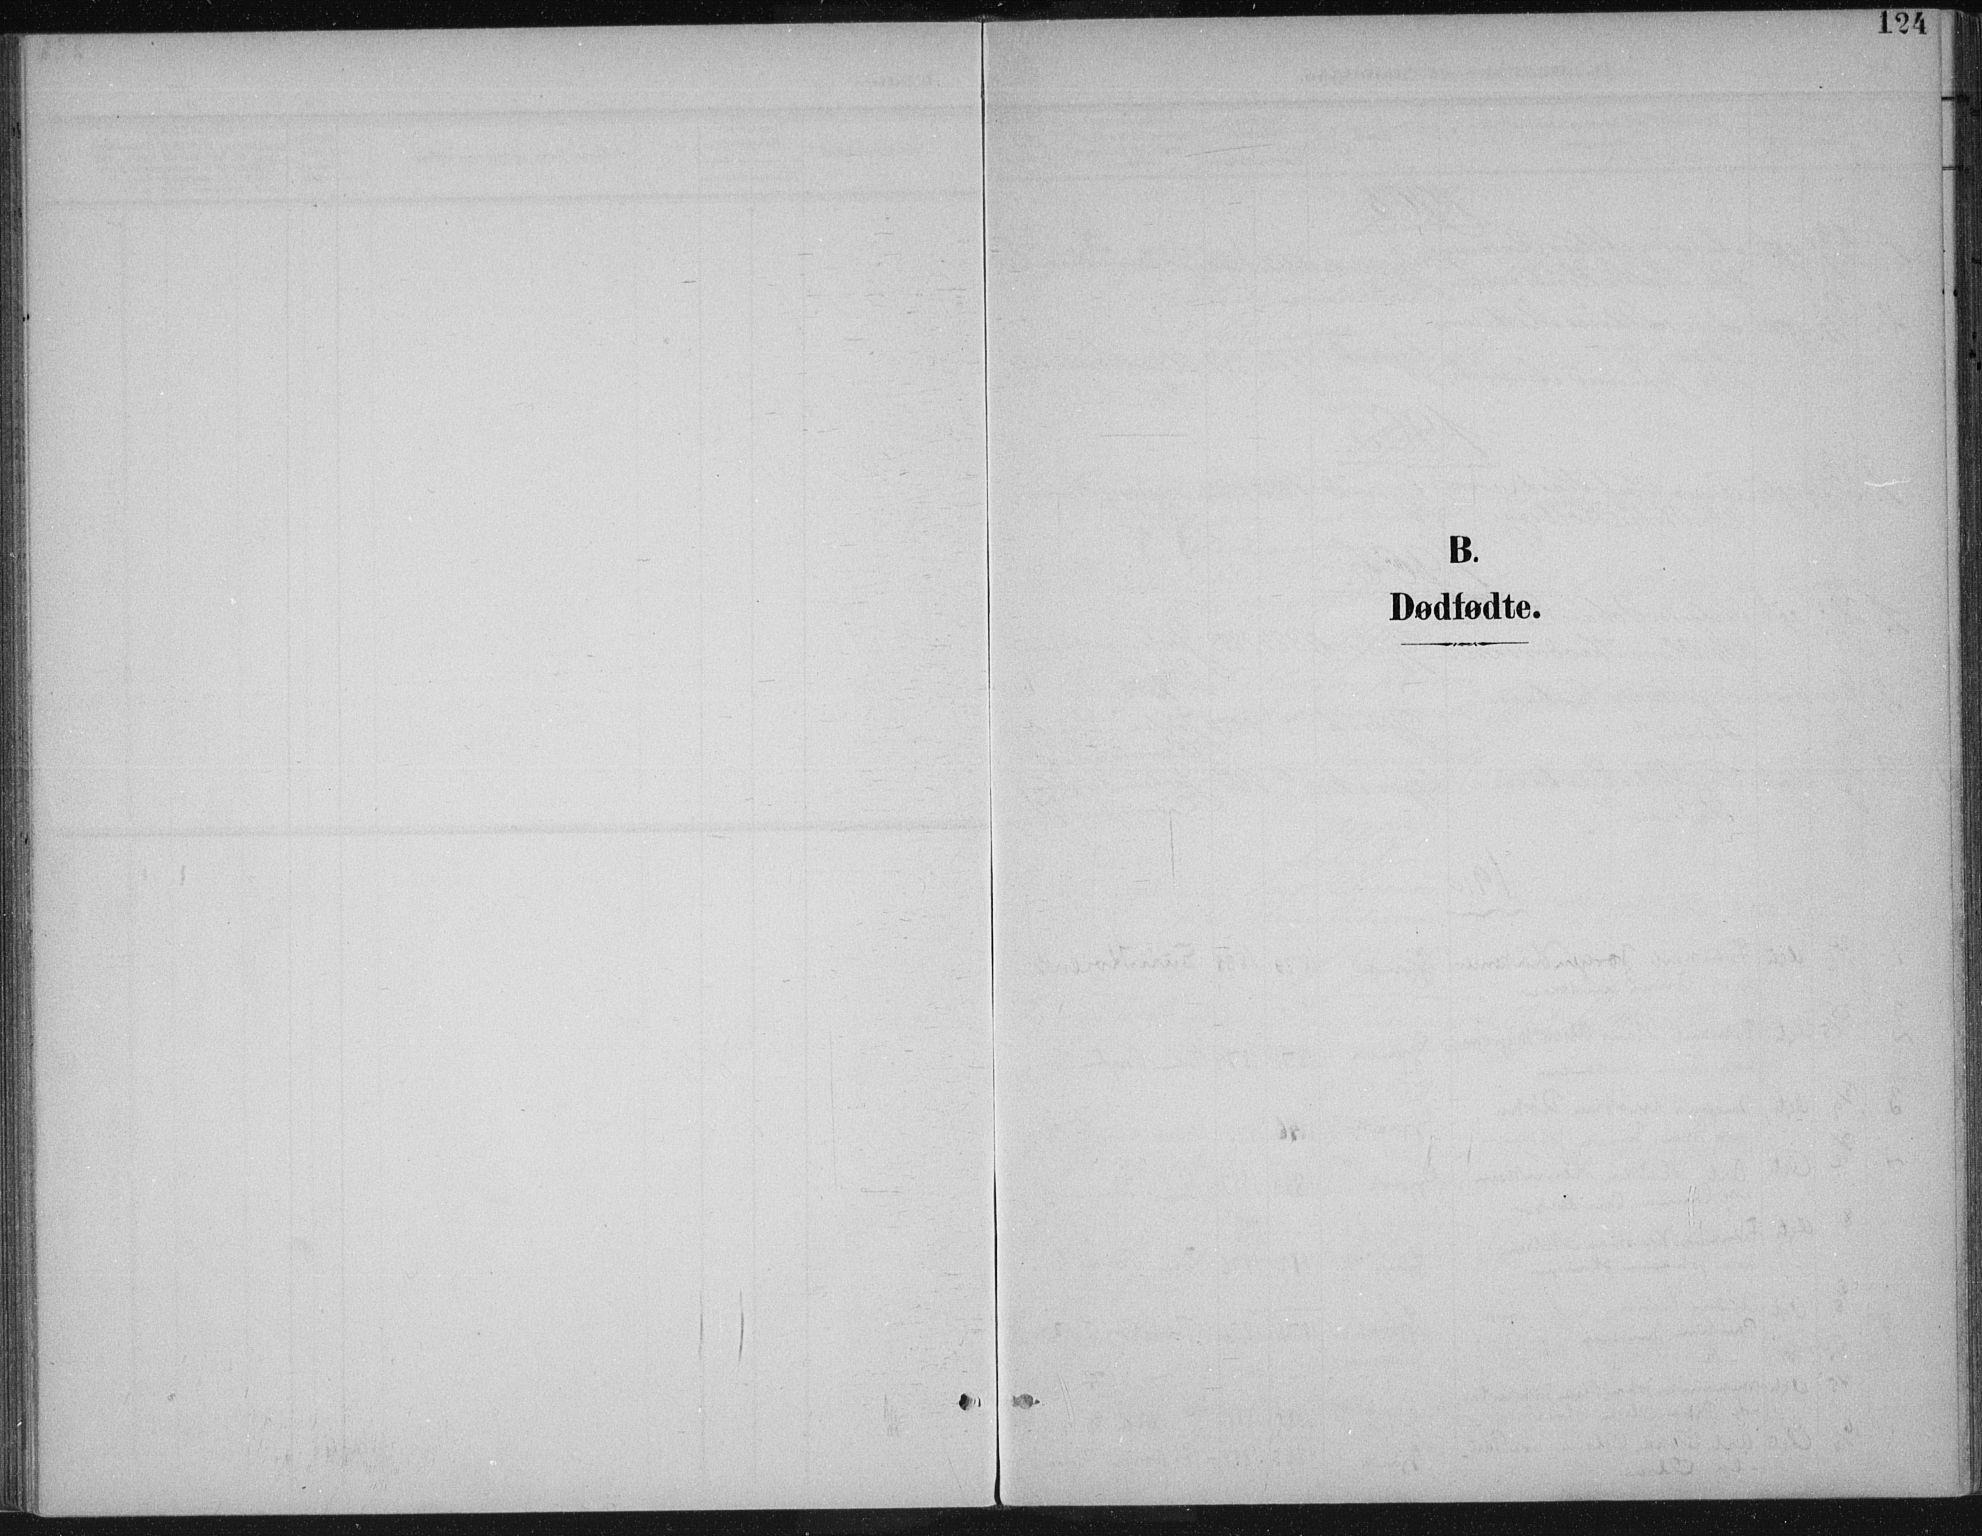 SAH, Vardal prestekontor, H/Ha/Haa/L0013: Ministerialbok nr. 13, 1901-1911, s. 124